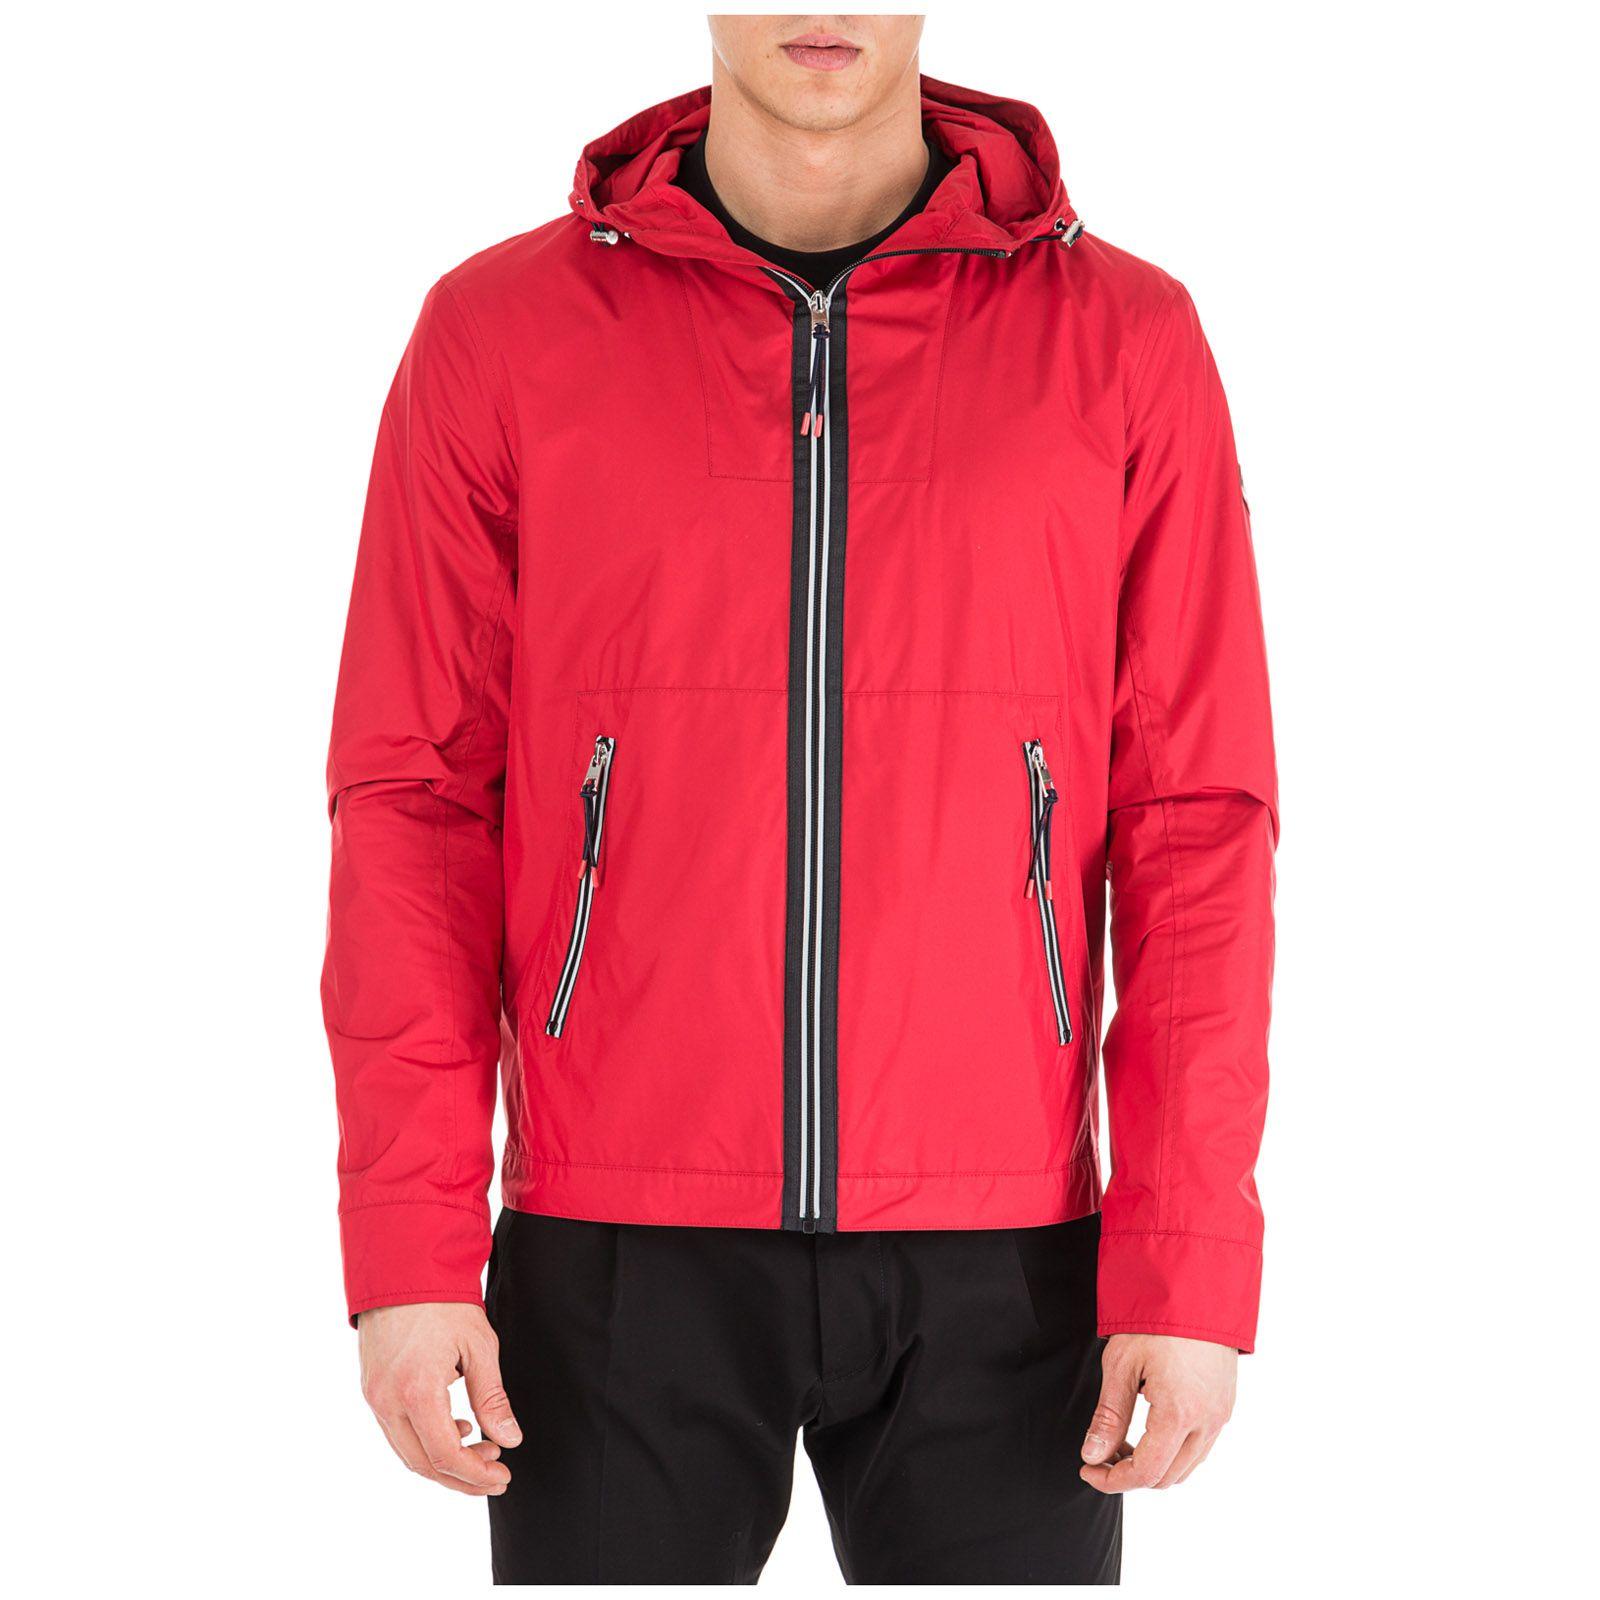 Michael Kors Men S Outerwear Jacket Blouson Michaelkors Cloth Mens Outerwear Jacket Outerwear Jackets Michael Kors Men [ 1600 x 1600 Pixel ]